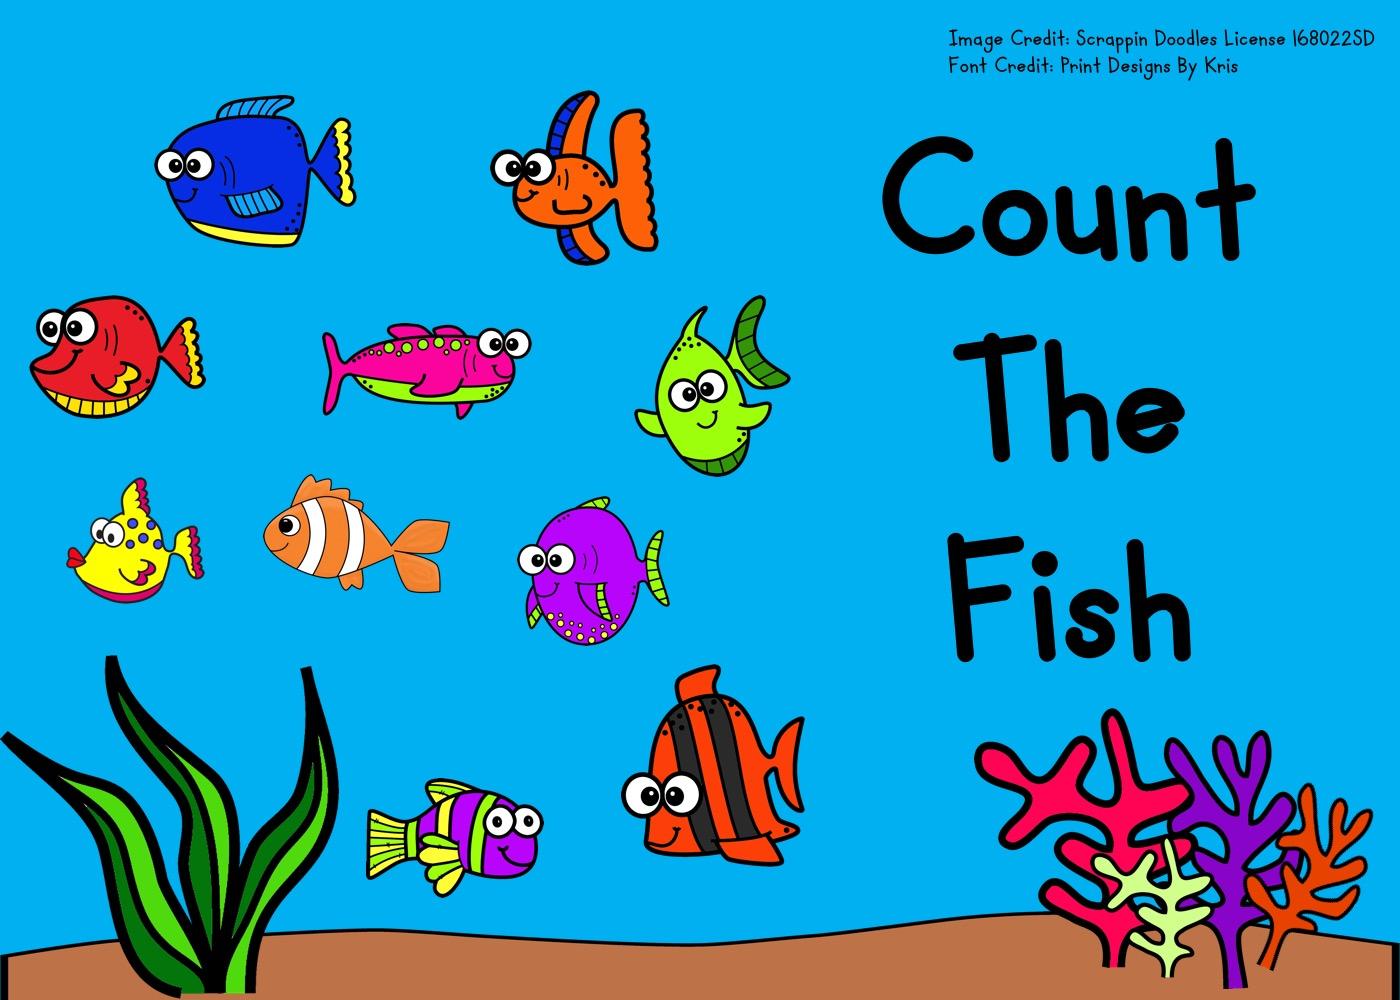 Fun Fish Printables for Preschool and Kindergarten | Ocean Themed Summer Games | Hands On Math Homeschool Activities | Kids Classroom Center Ideas and Worksheets #FreePrintableWorksheetsForKids #fish #ocean #summer #clipcards #counting